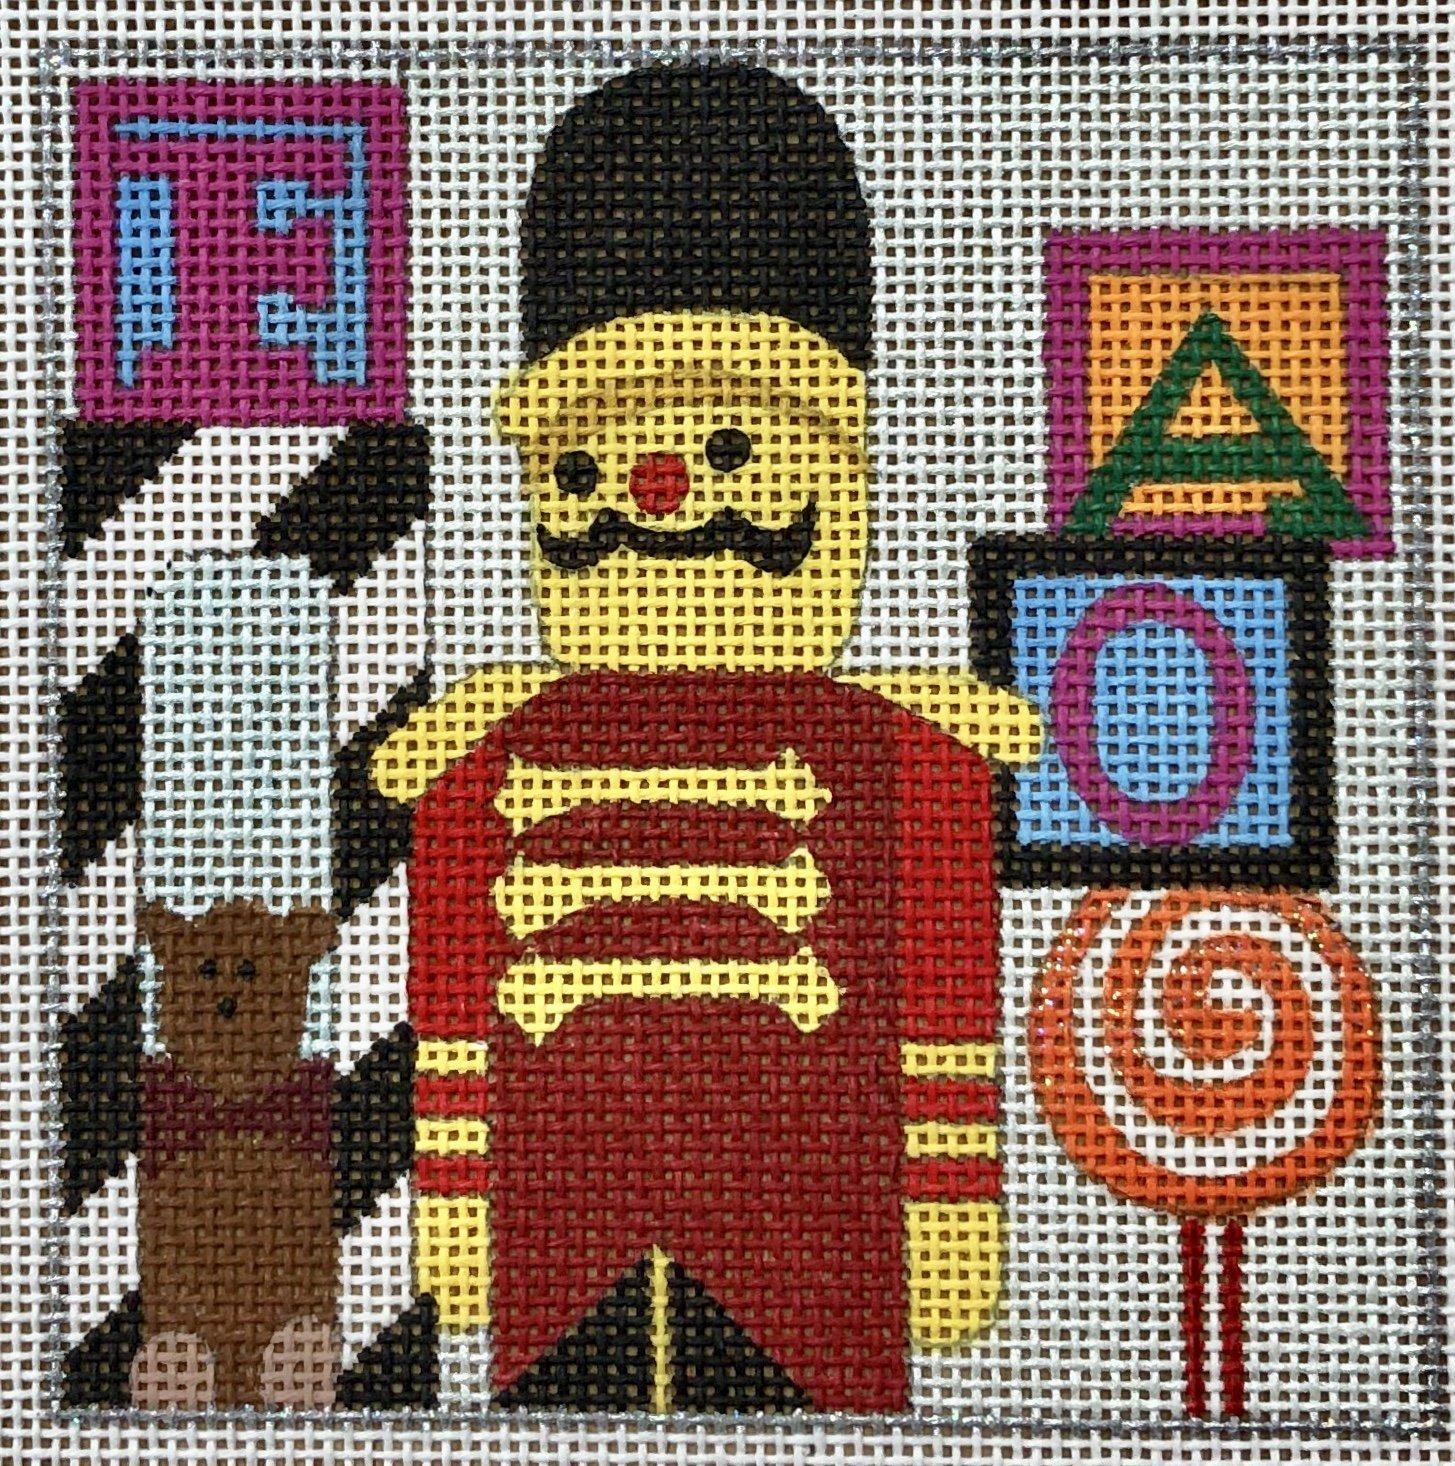 nyc windows - fao w stitch guide